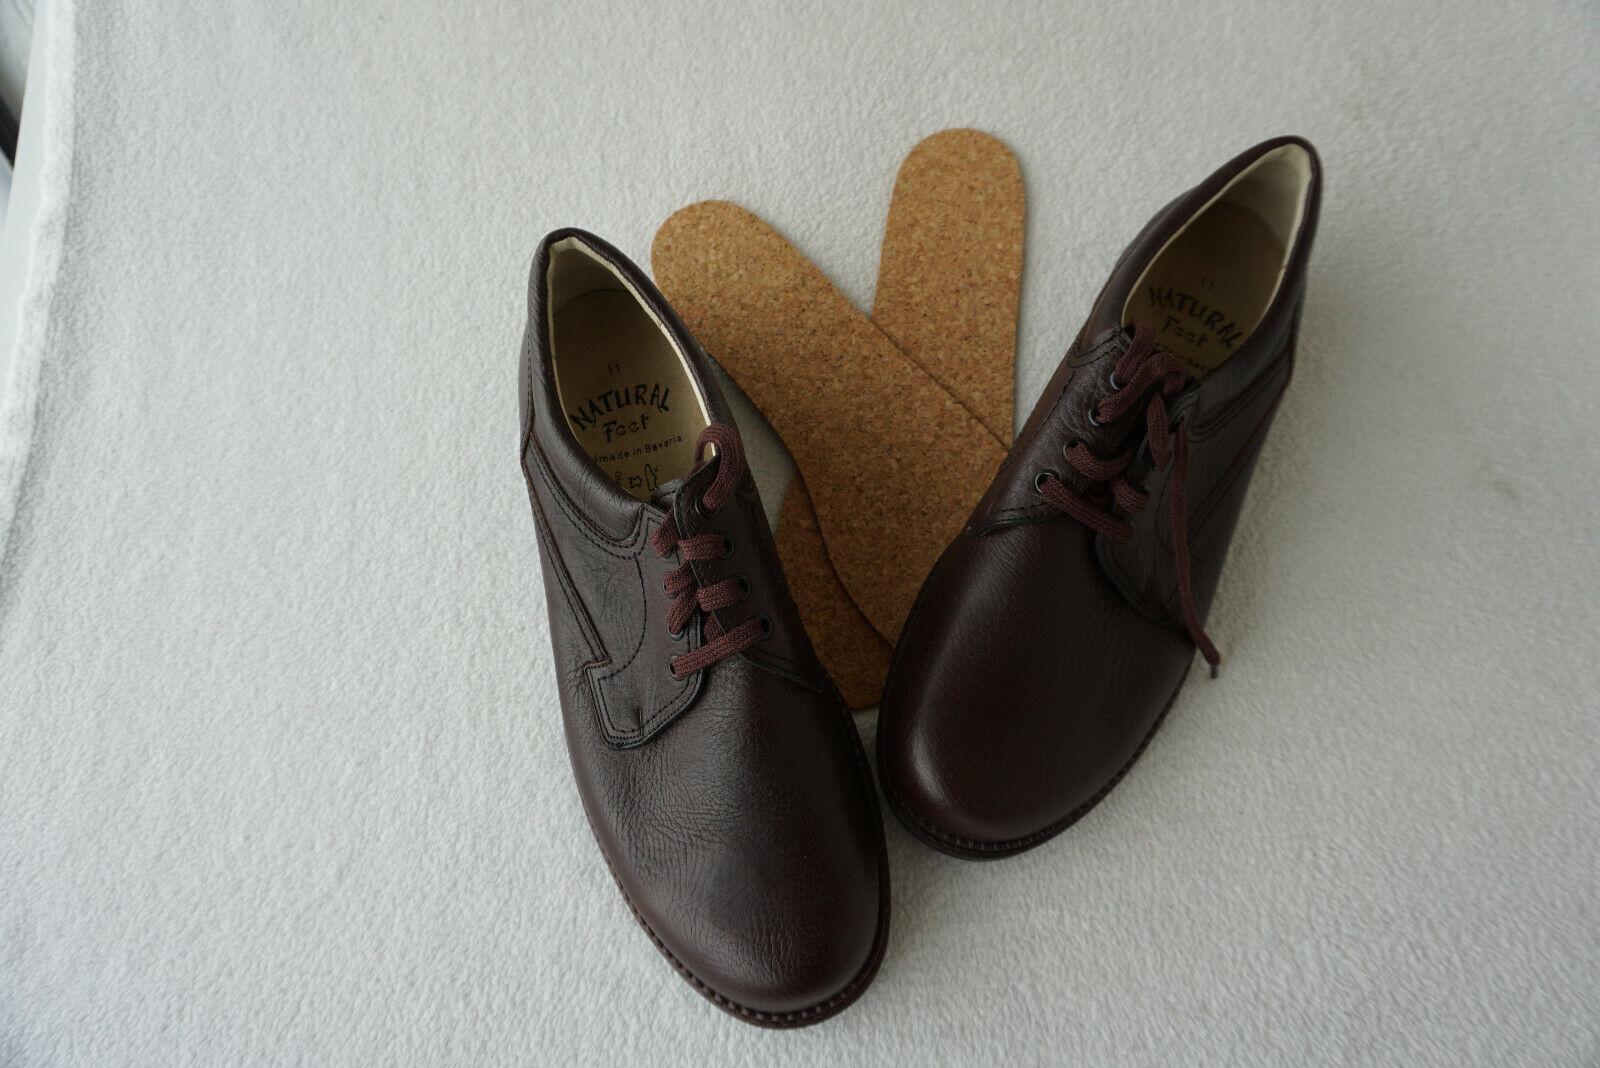 Orthopädische Natural Feet Herren Men Schuhe Schnürschuhe Gr.11   45,5 Leder NEU